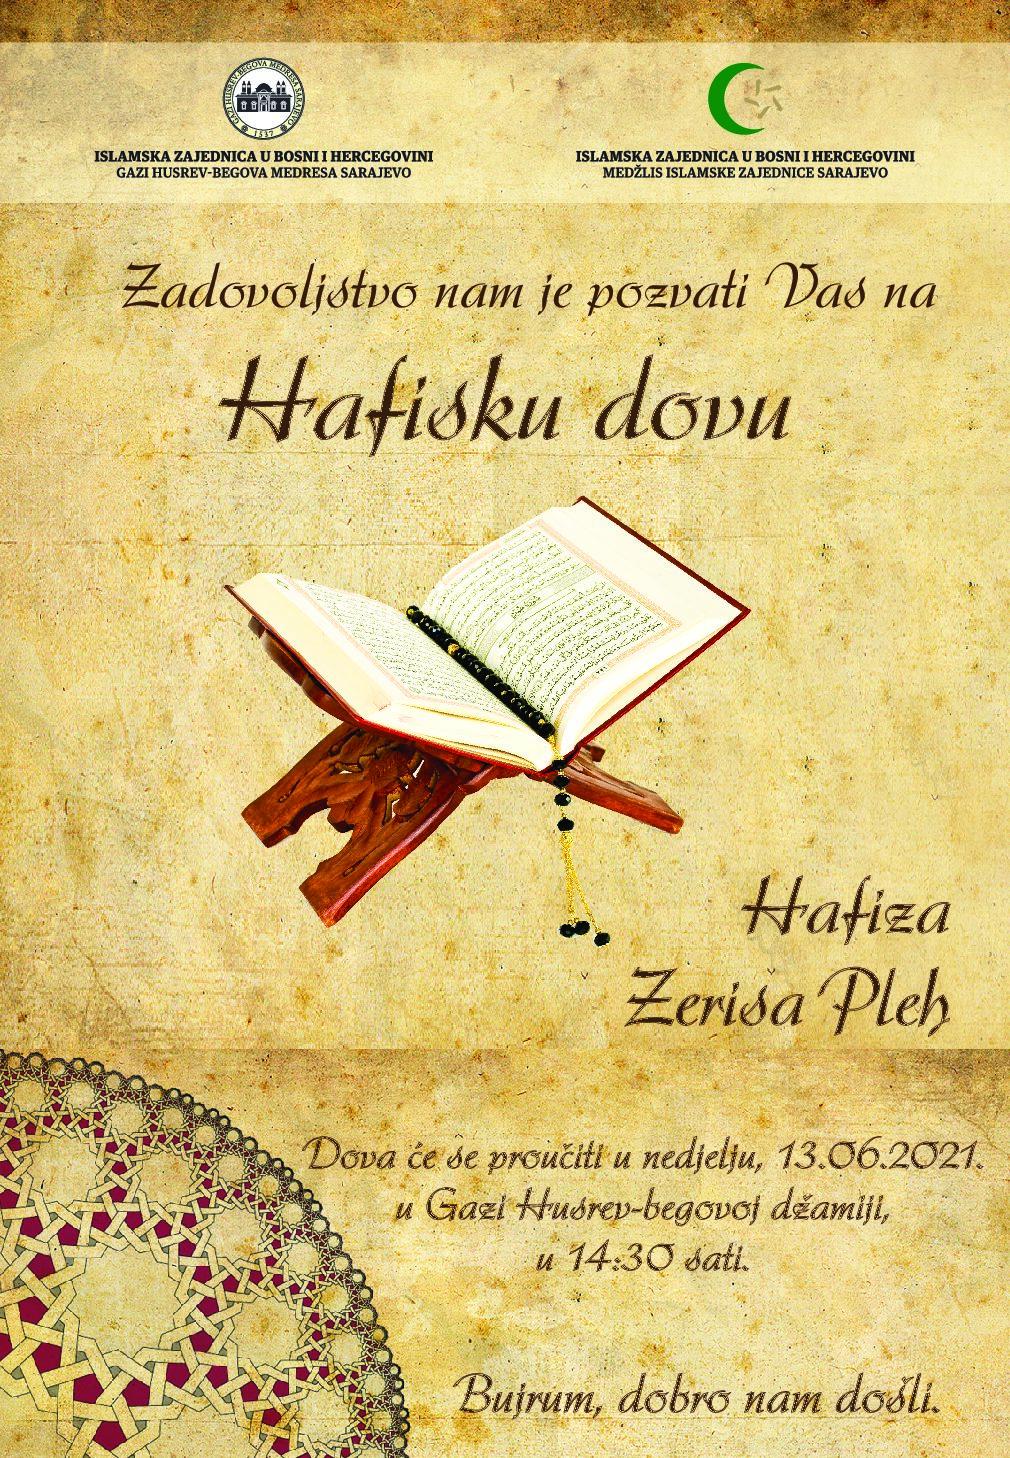 Hafiska dova hafizi Zerisi Pleh